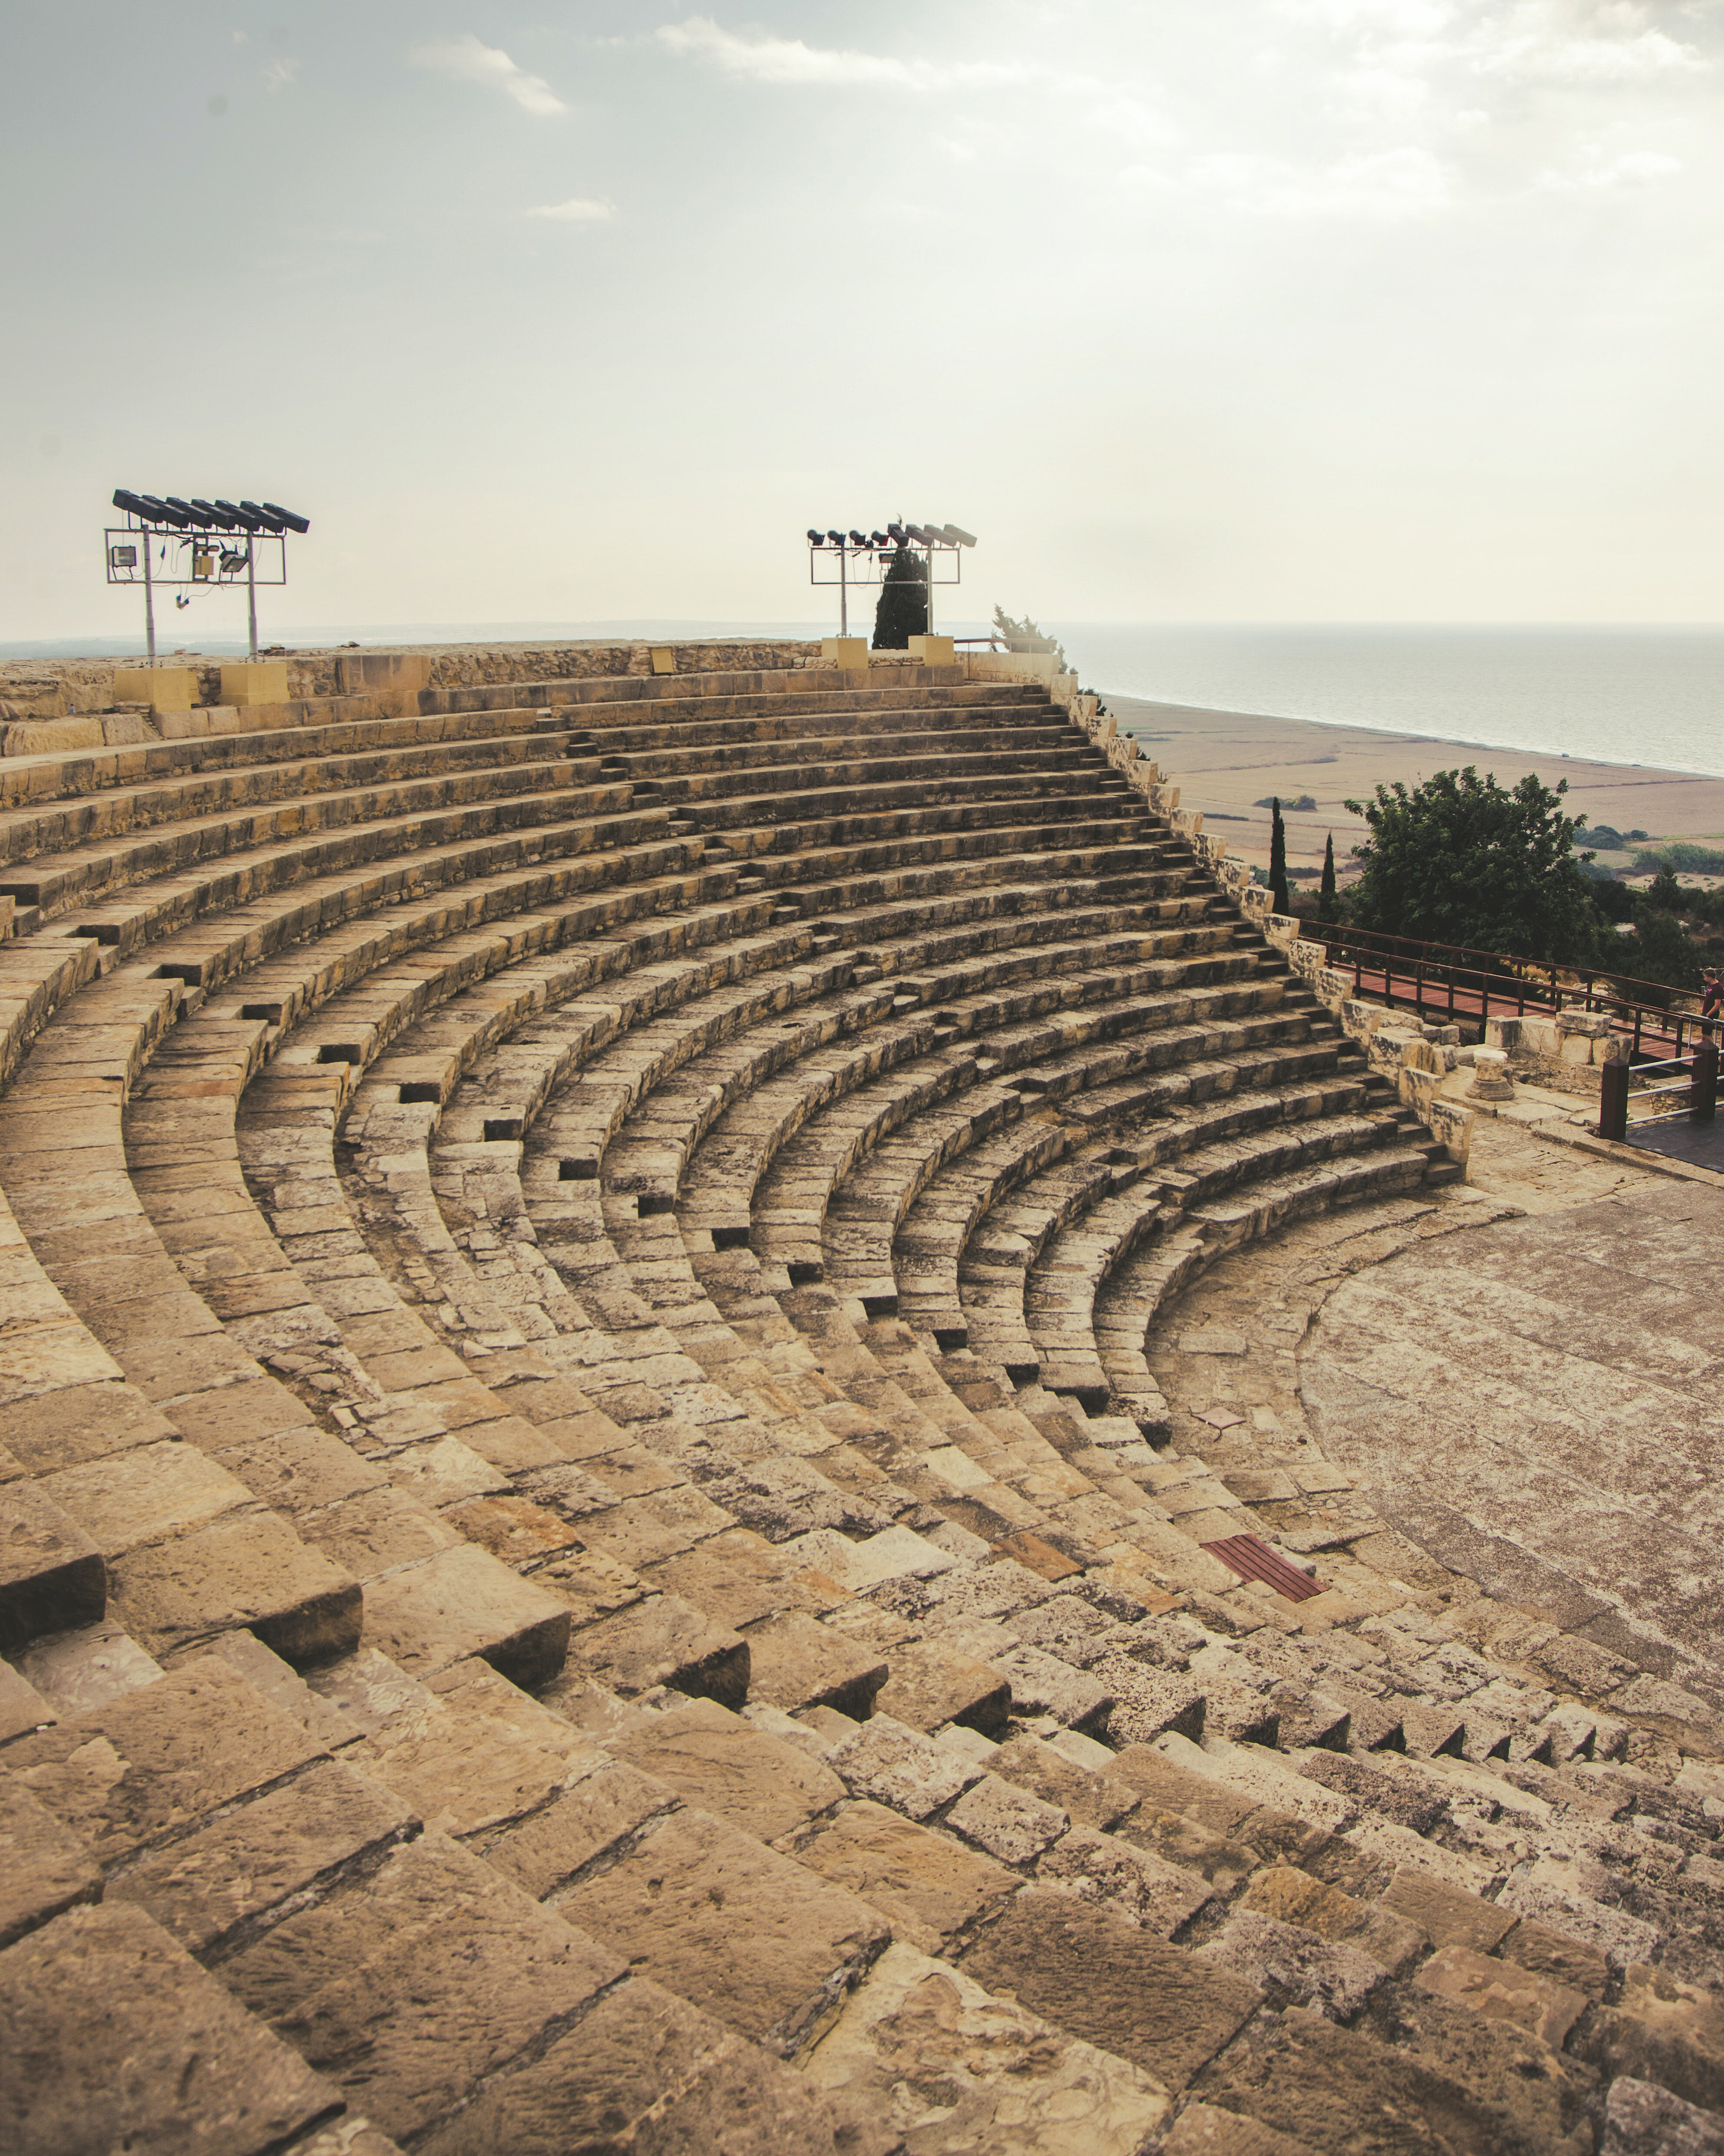 Tour the Kourion archaeological site